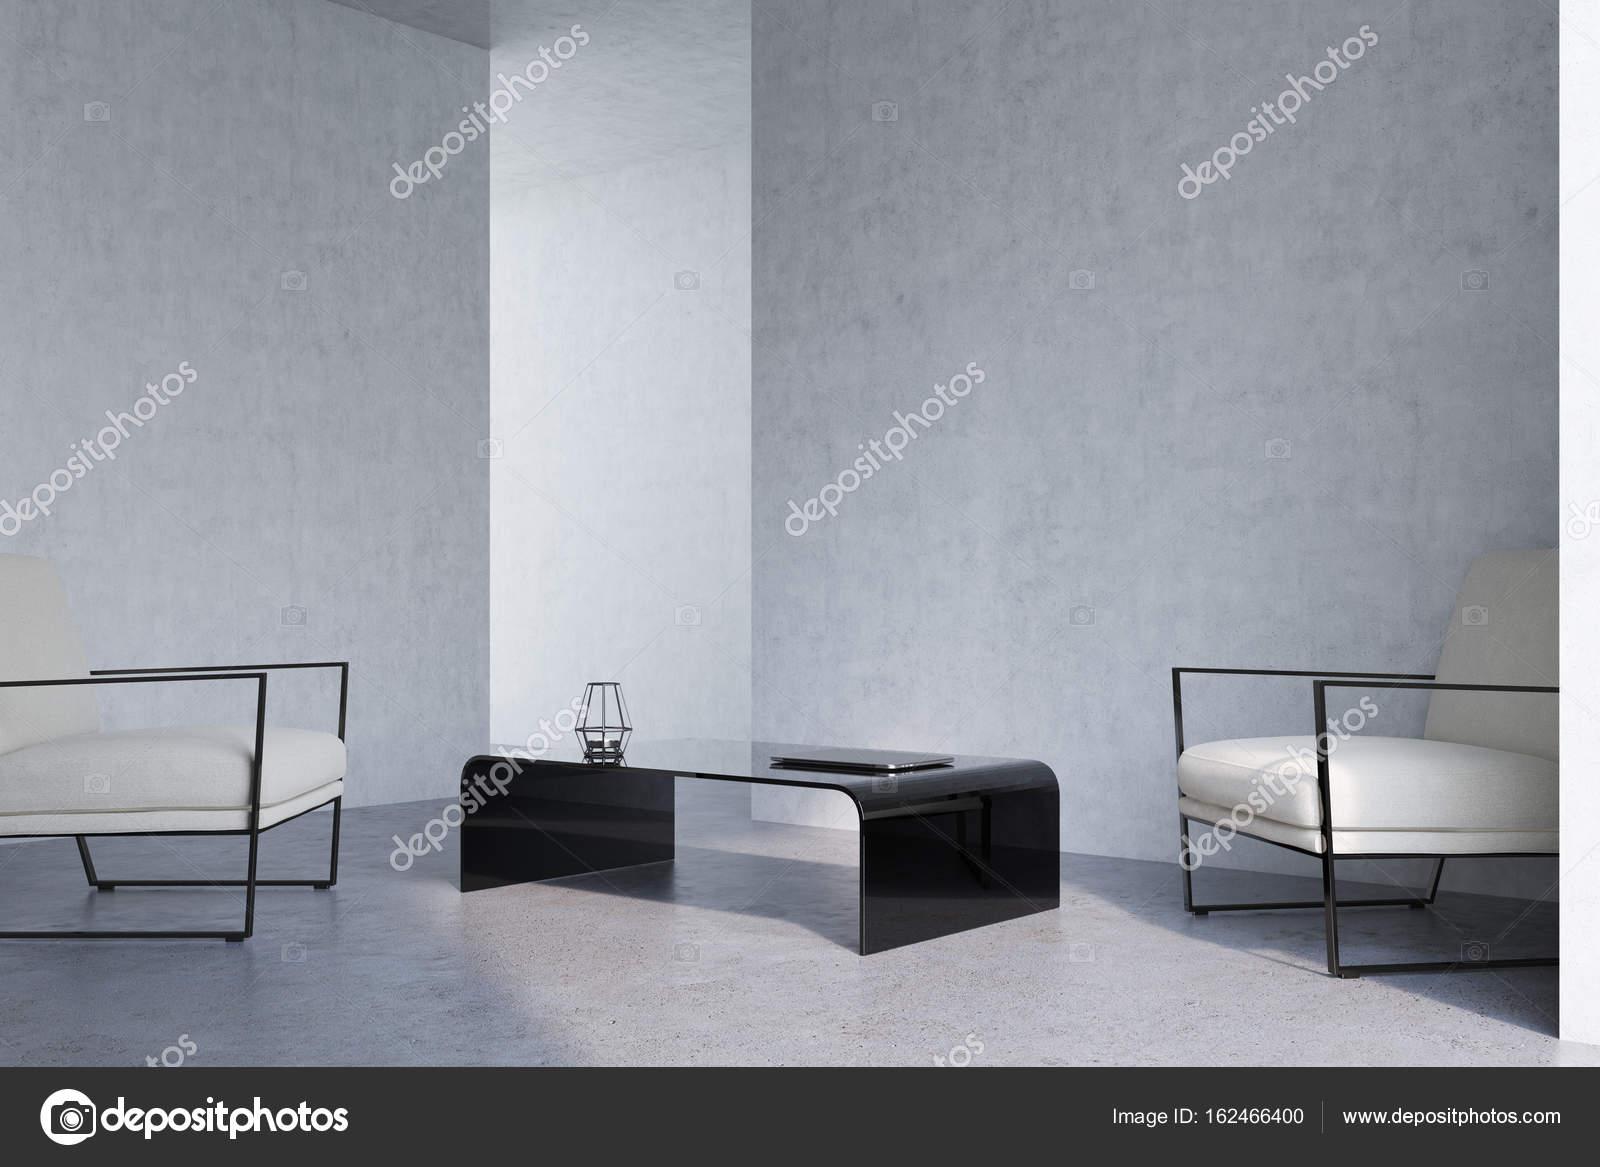 Beton woonkamer, Fauteuils, hoek — Stockfoto © denisismagilov #162466400